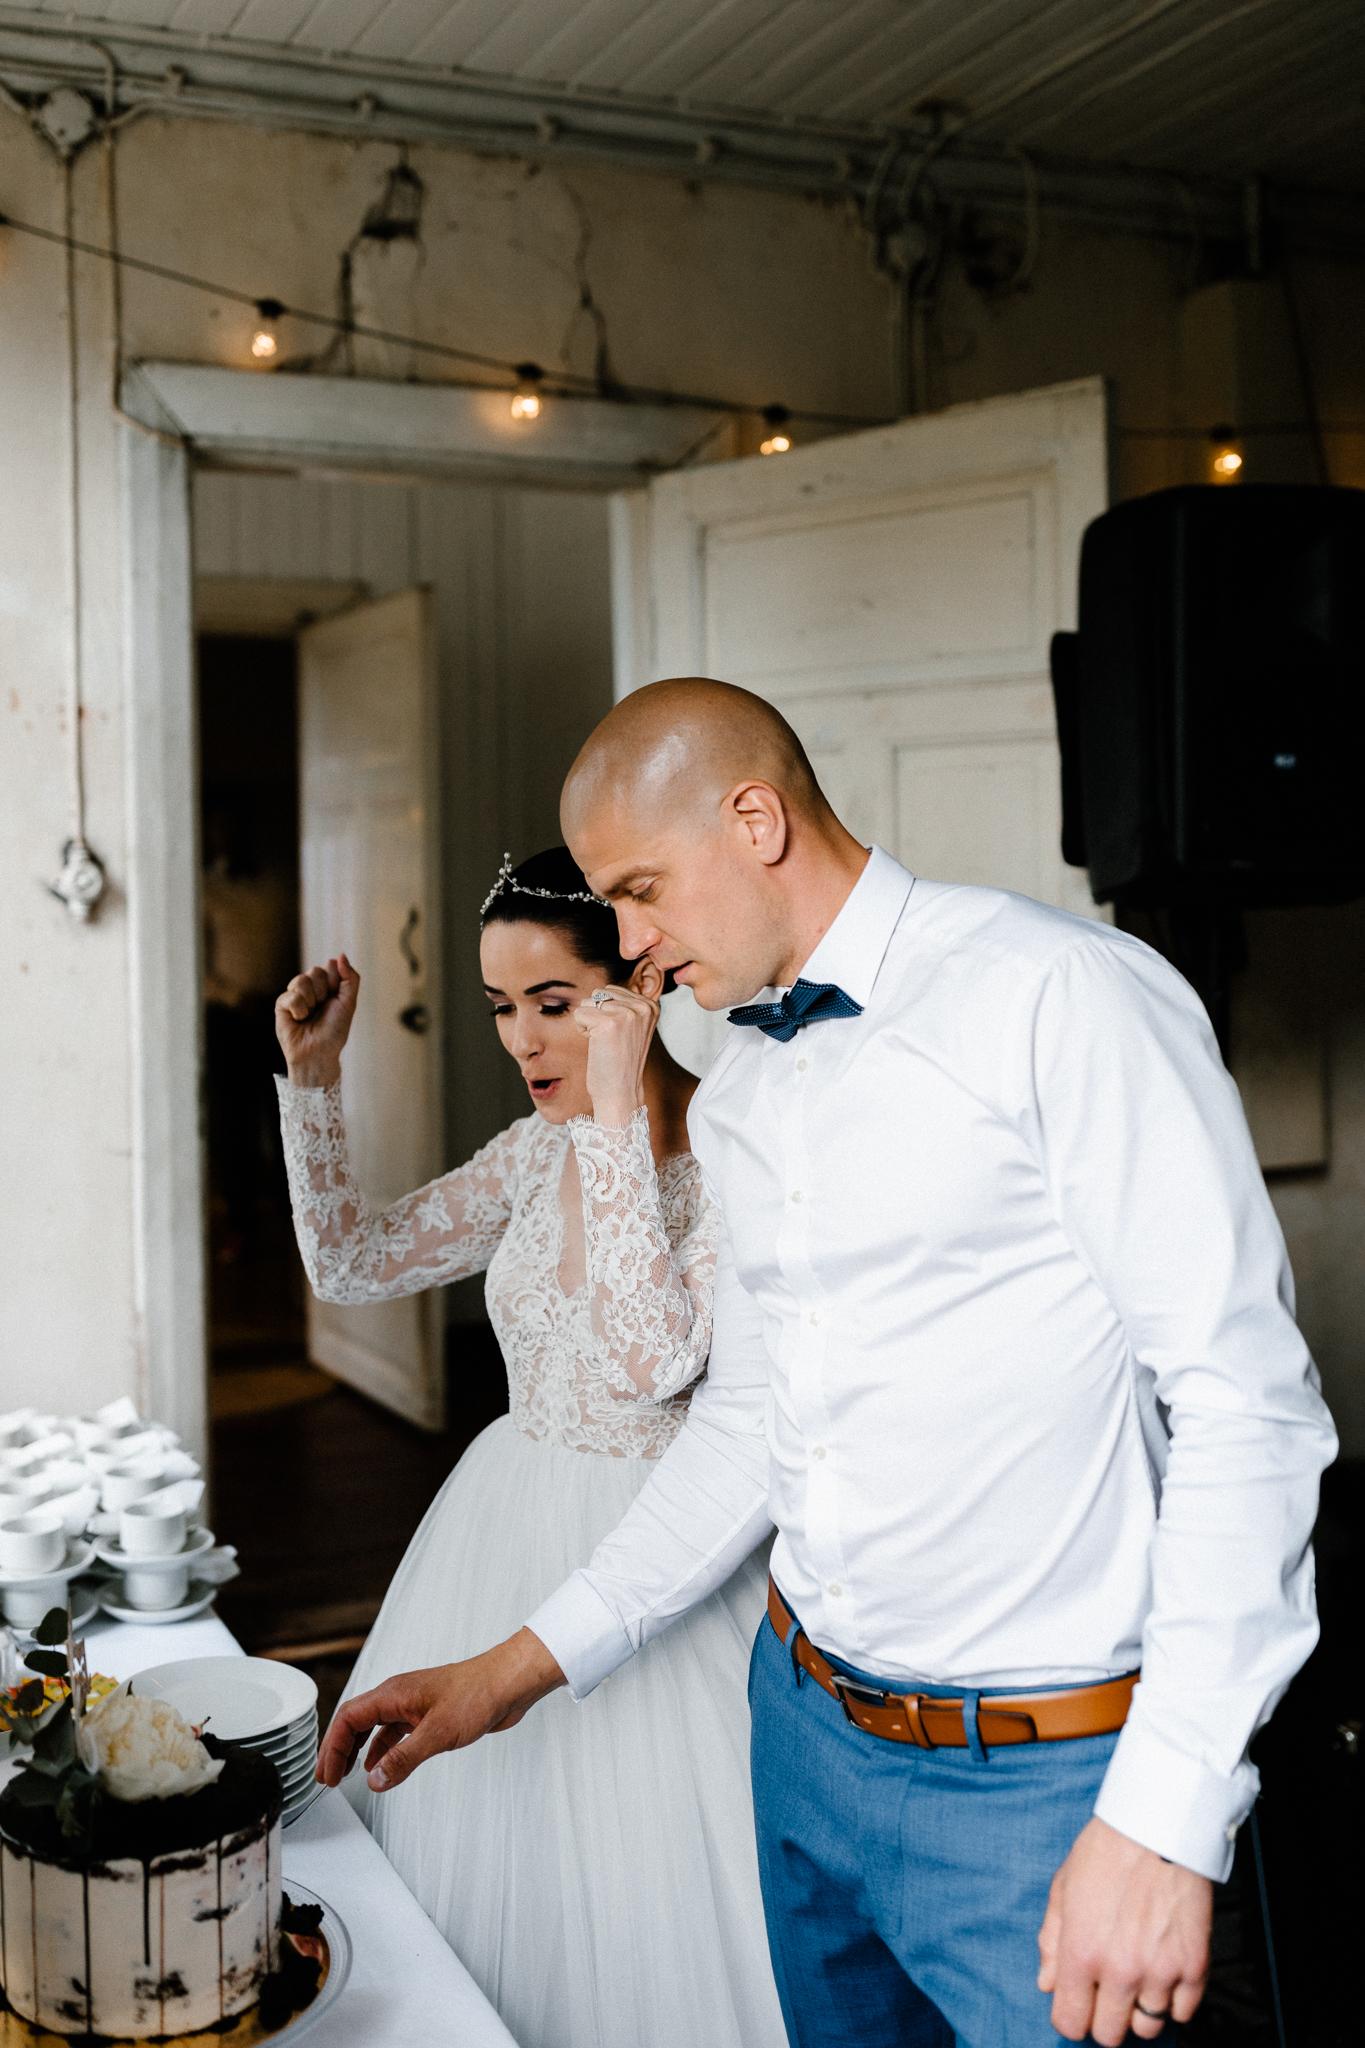 Essi + Ville   Oitbacka Gården   by Patrick Karkkolainen Wedding Photography-253.jpg